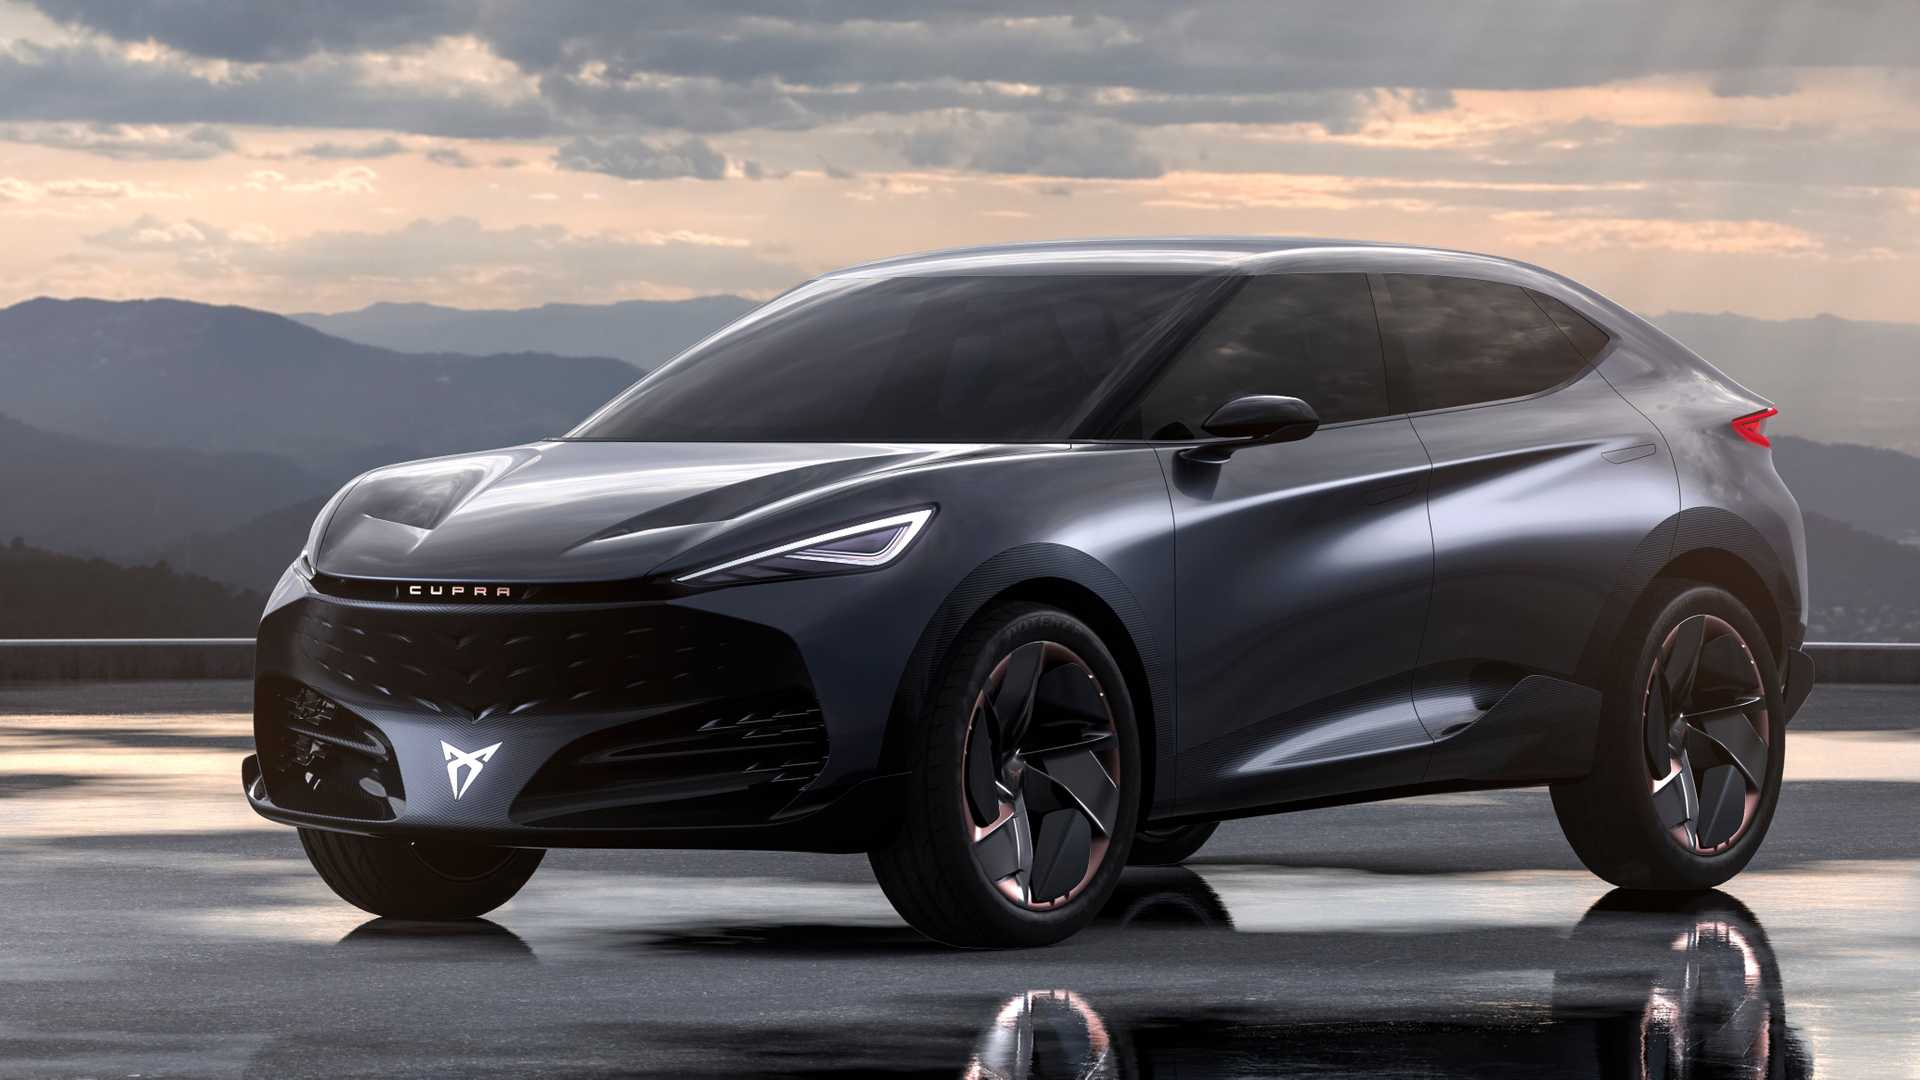 Cupra unveils the Tavascan concept